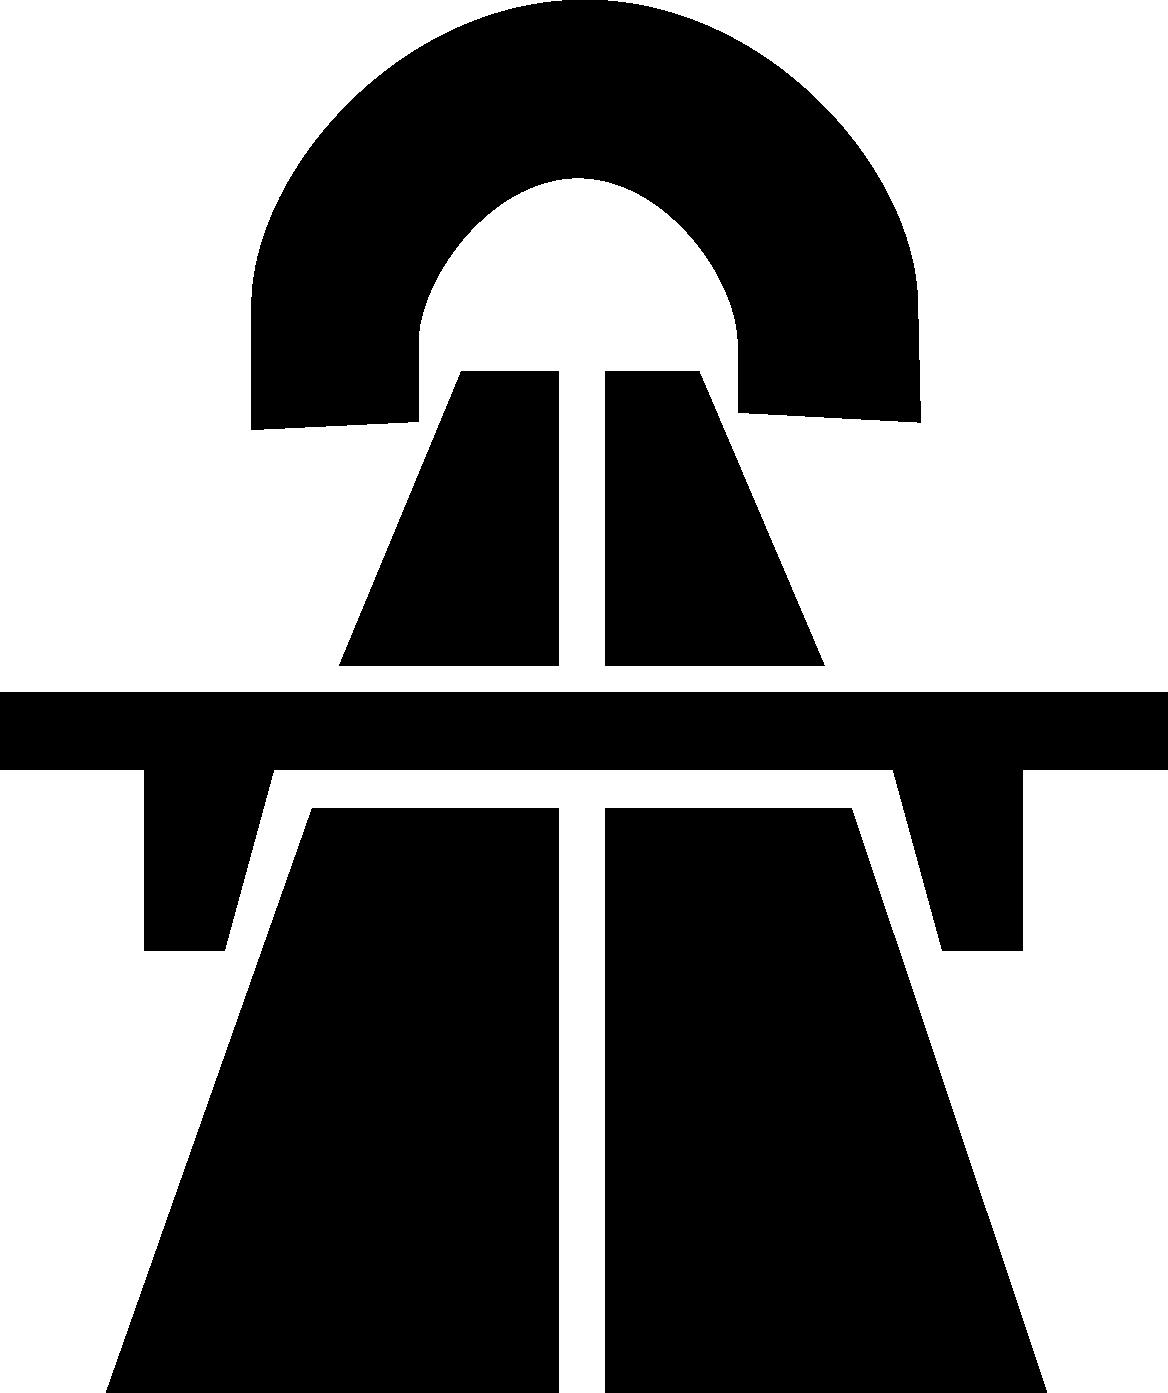 Highway, Bridge & Tunnel